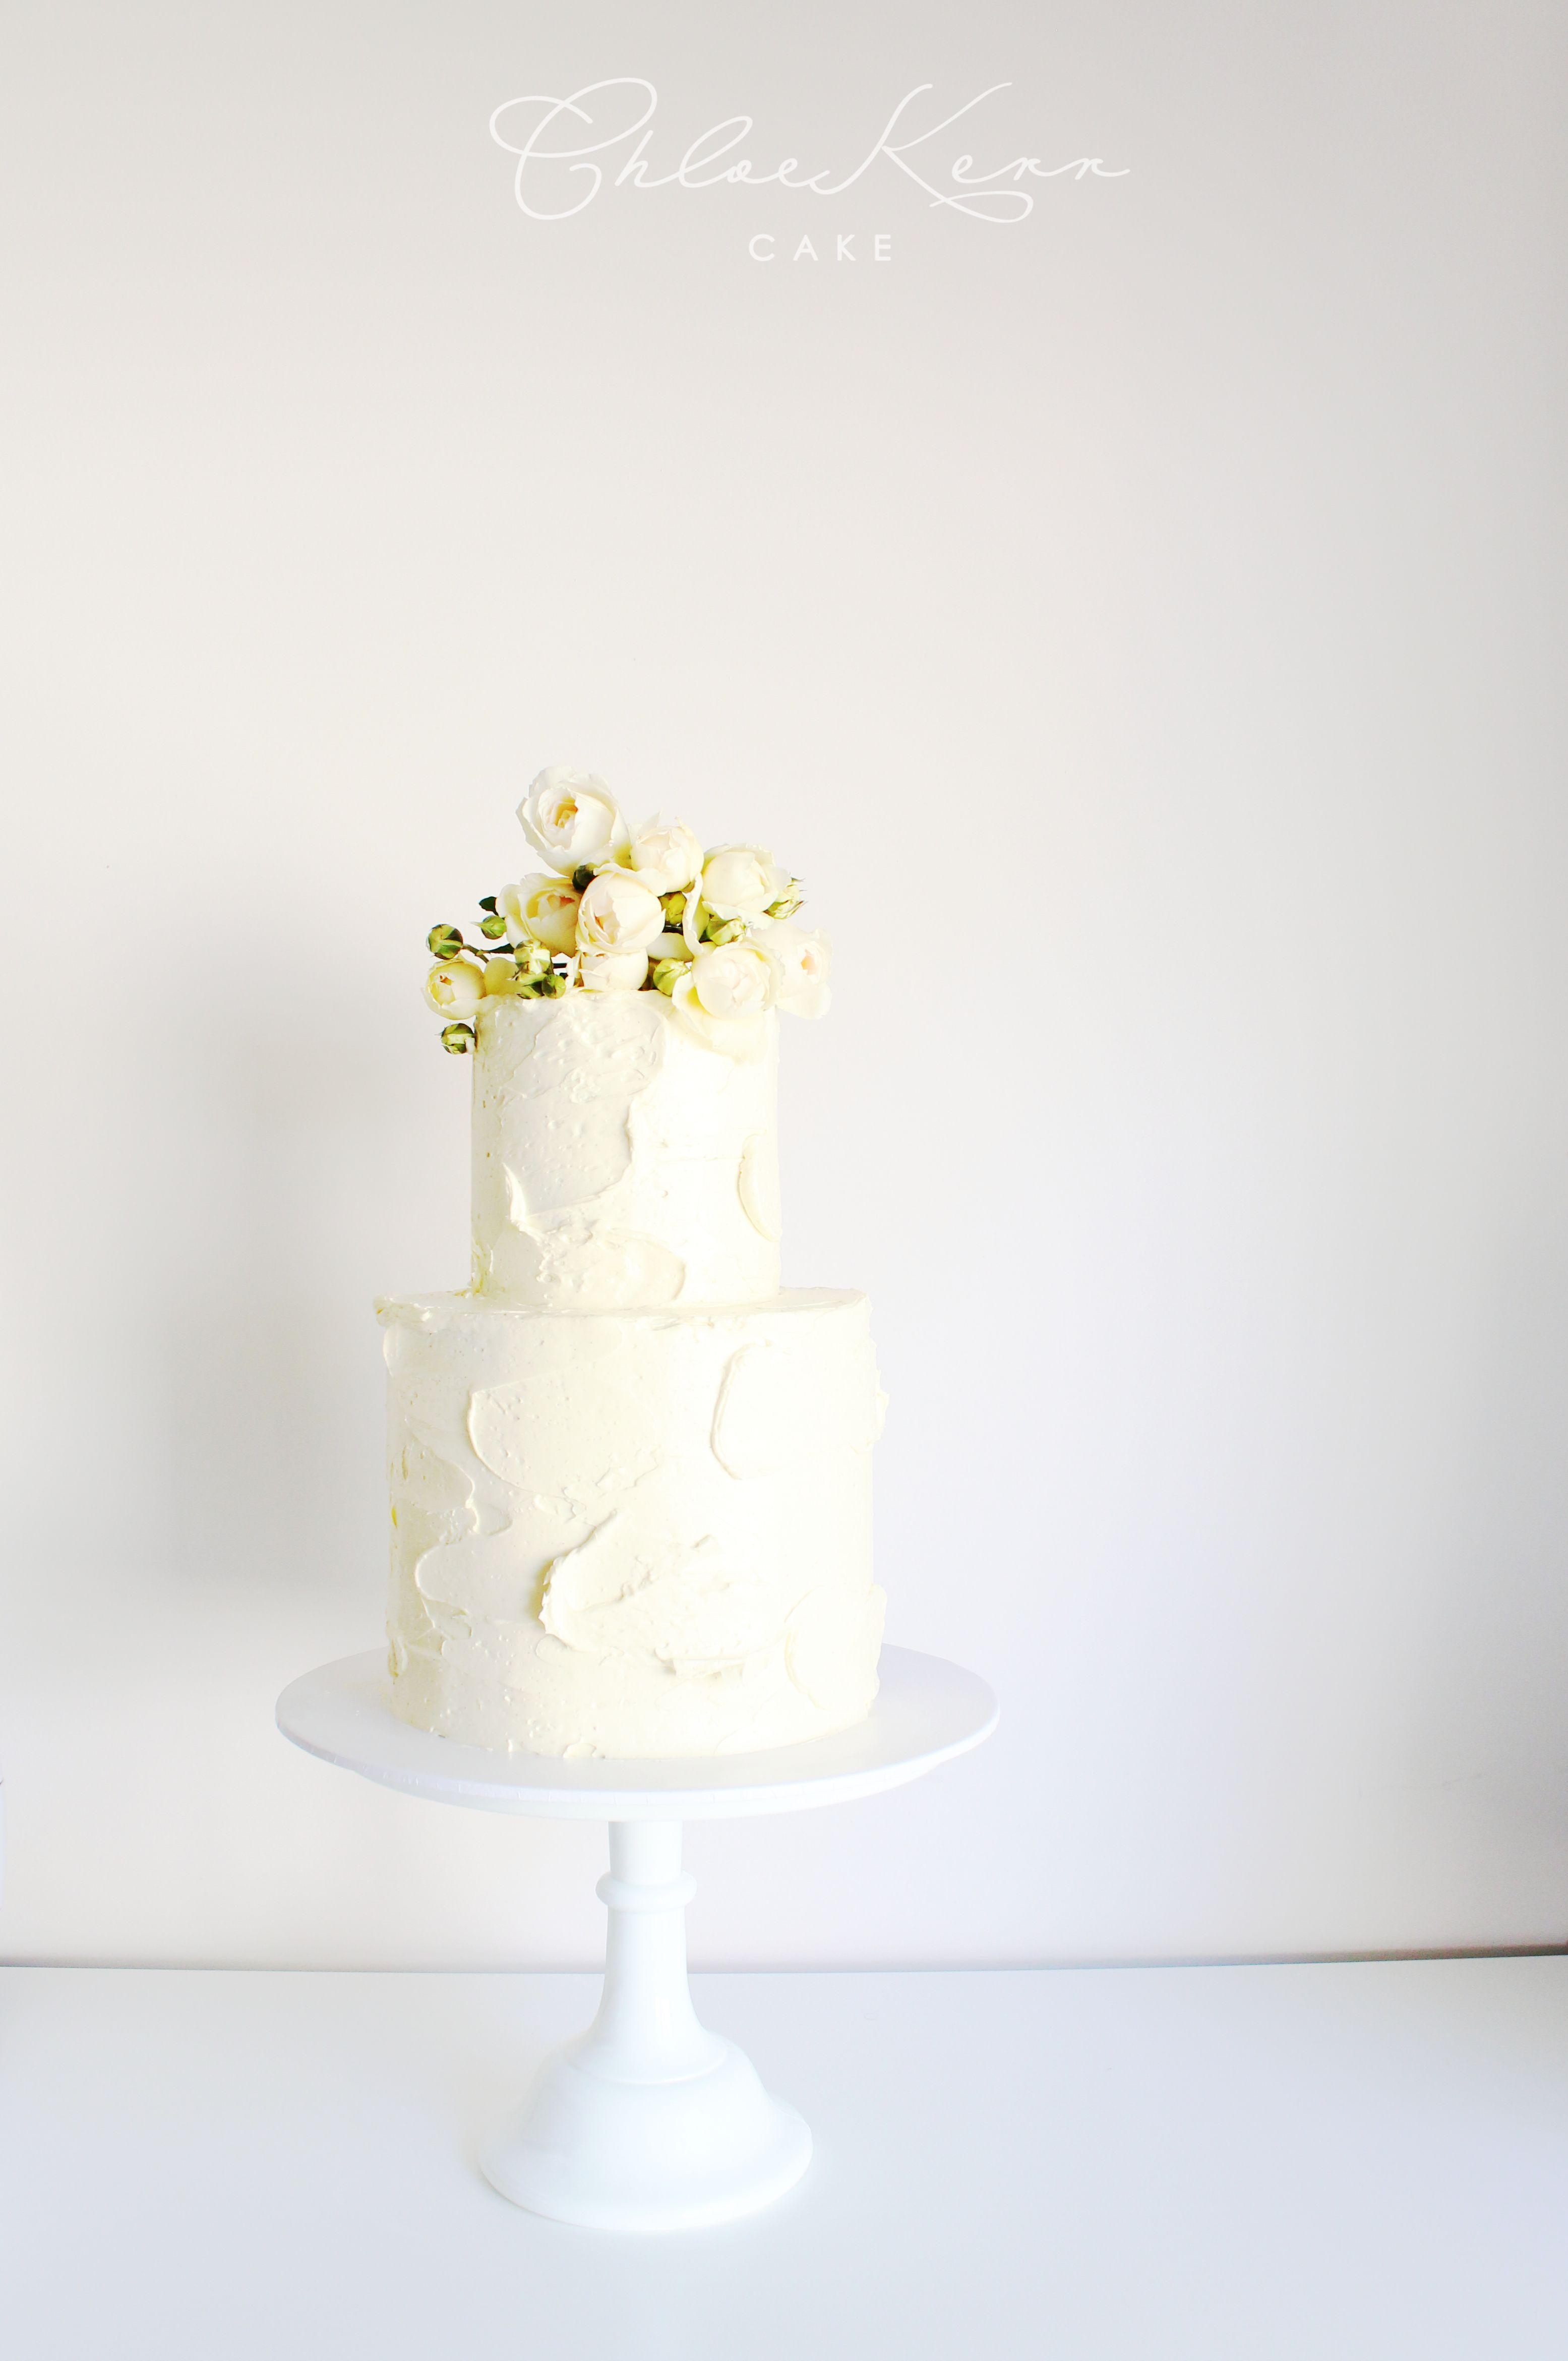 Chloe Kerr Cake   Wedding Wedding Cake in Wollongong   Bridestory.com